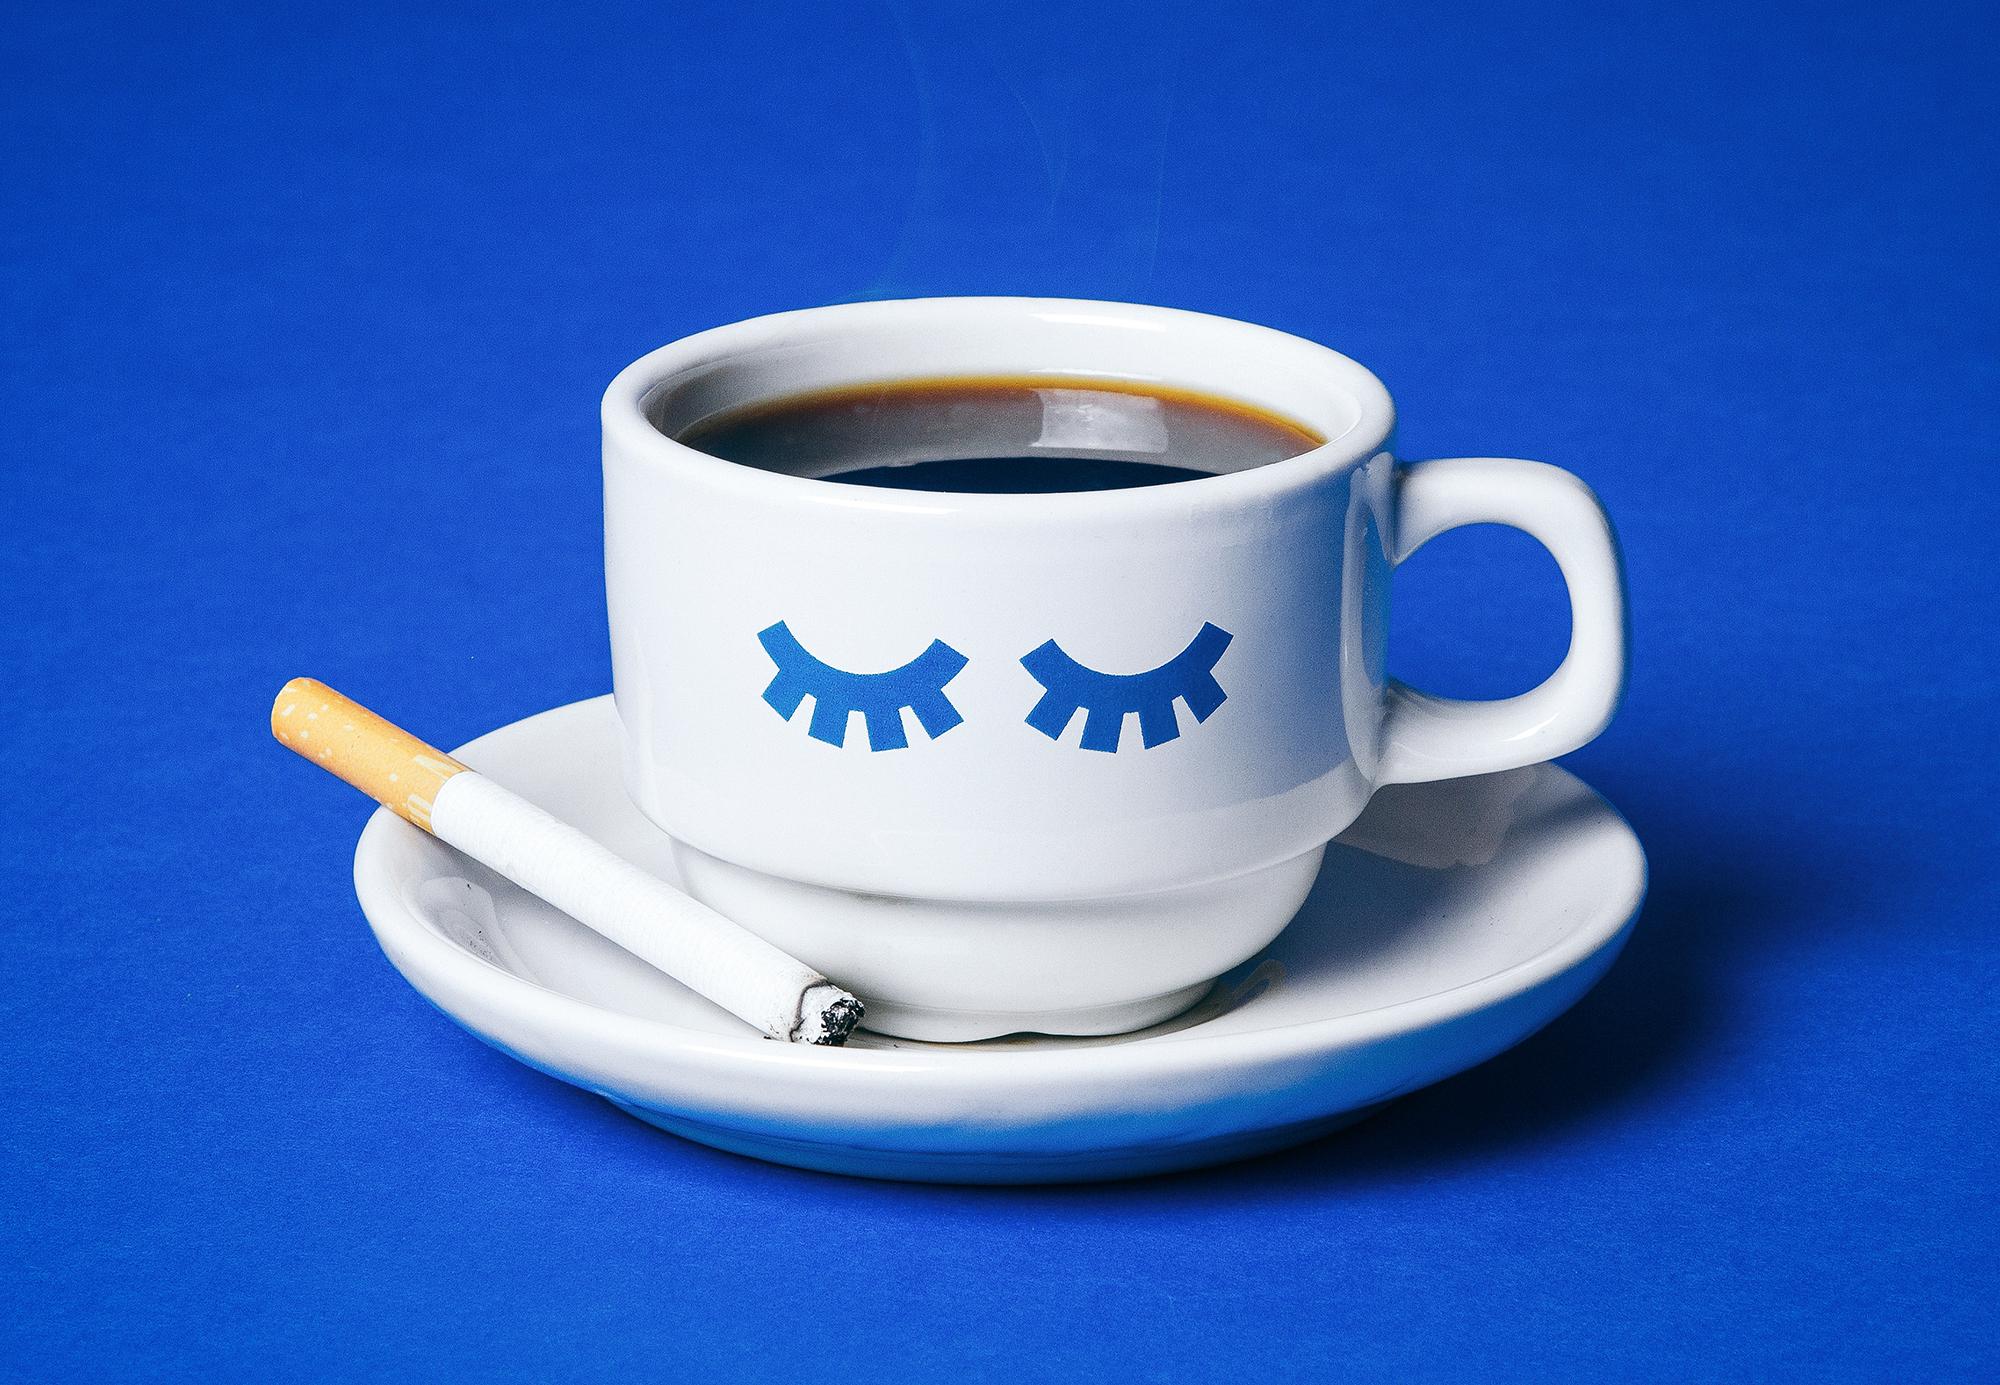 kaibosh_21_coffee-cup.jpg